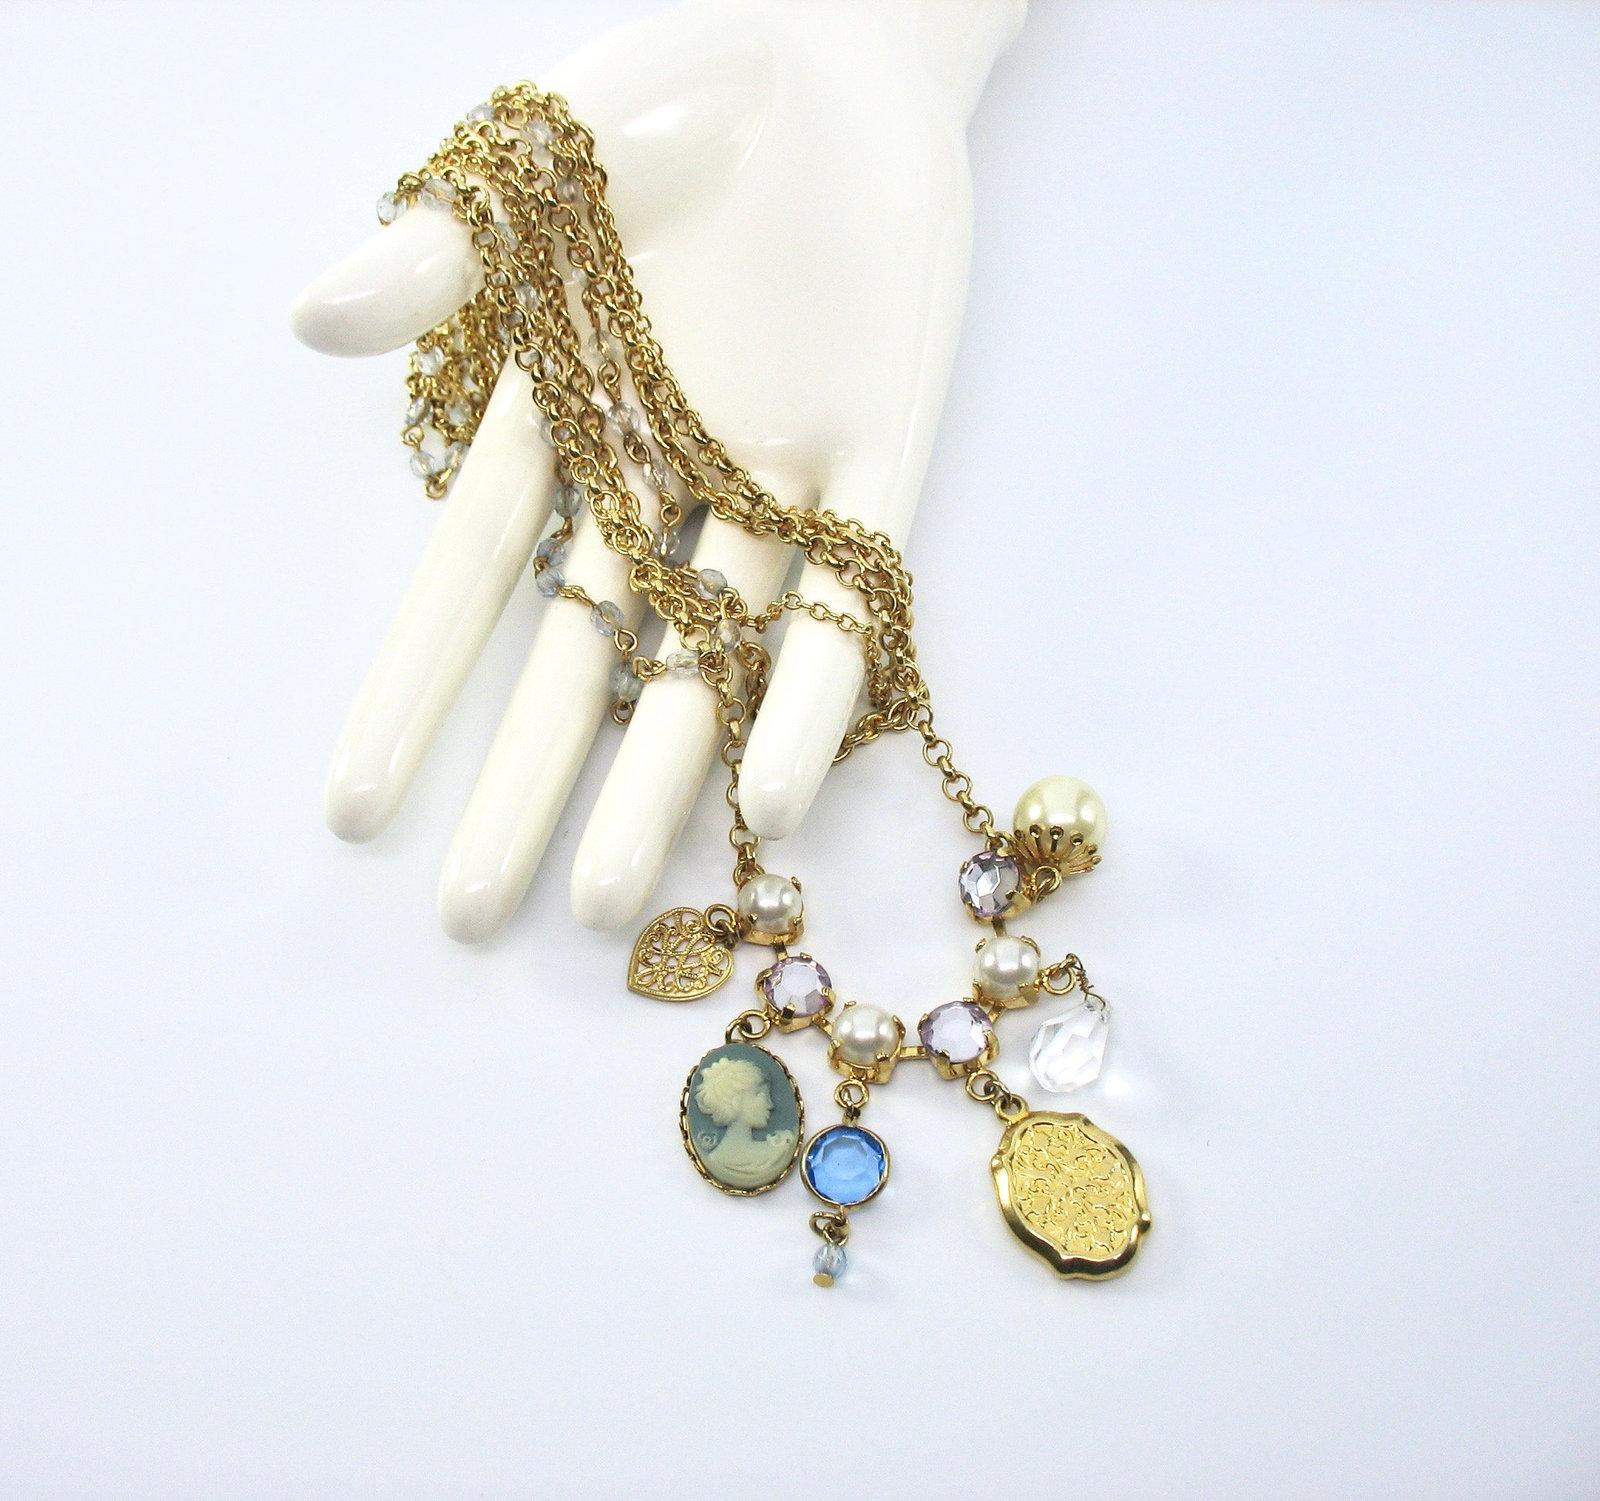 Multiple Chain Necklace, Multi Chains, Boho, White Pearls, Rhinestones, Cameo, C